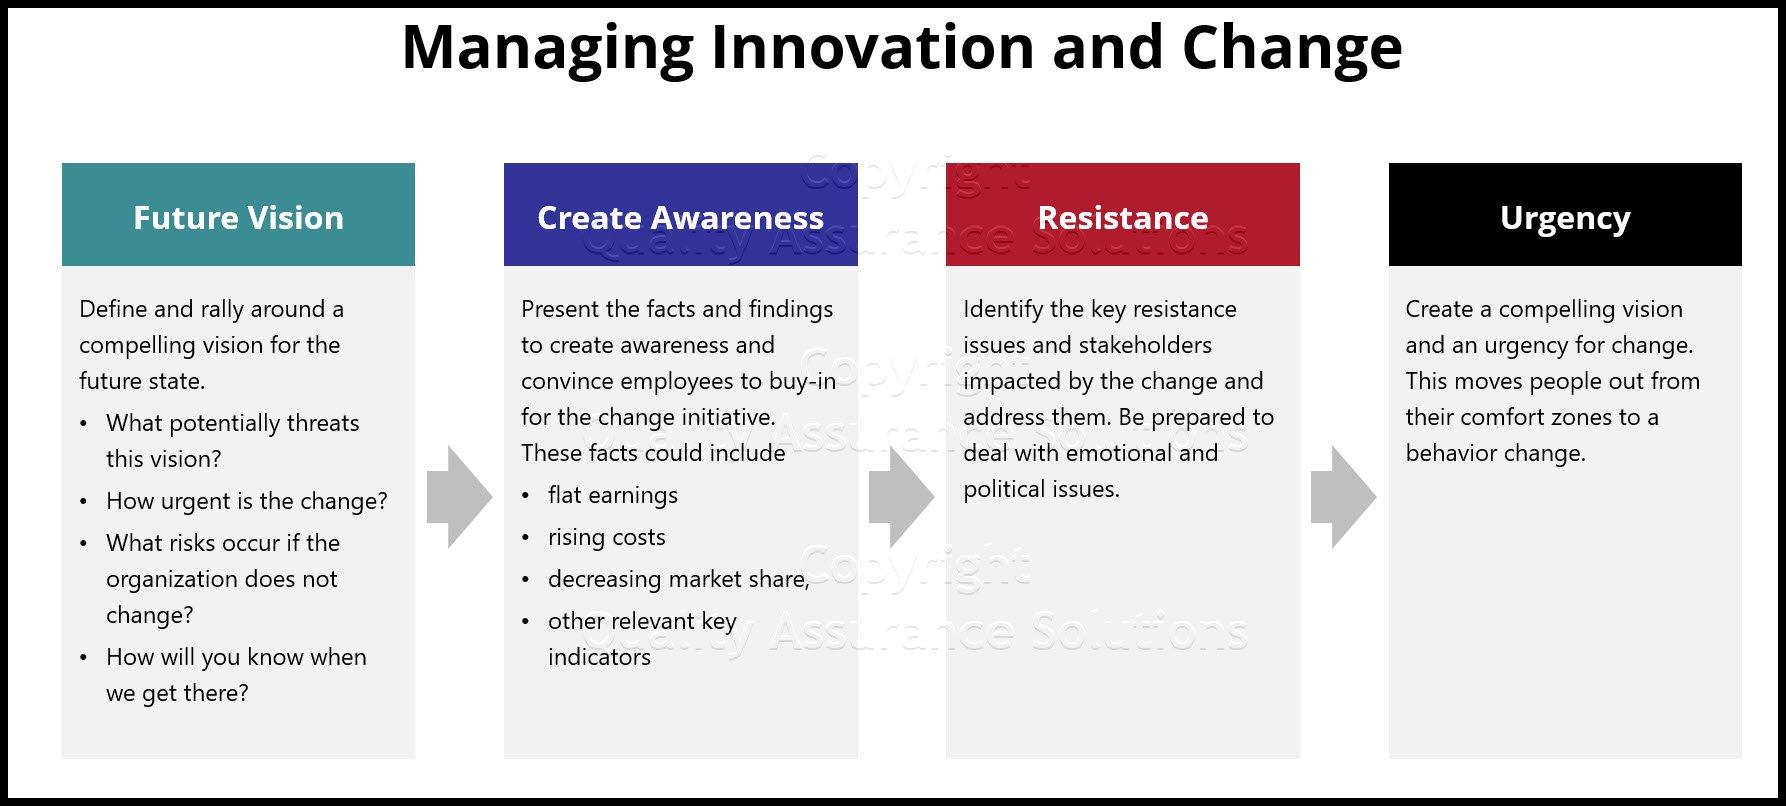 managing innovation and change business slide